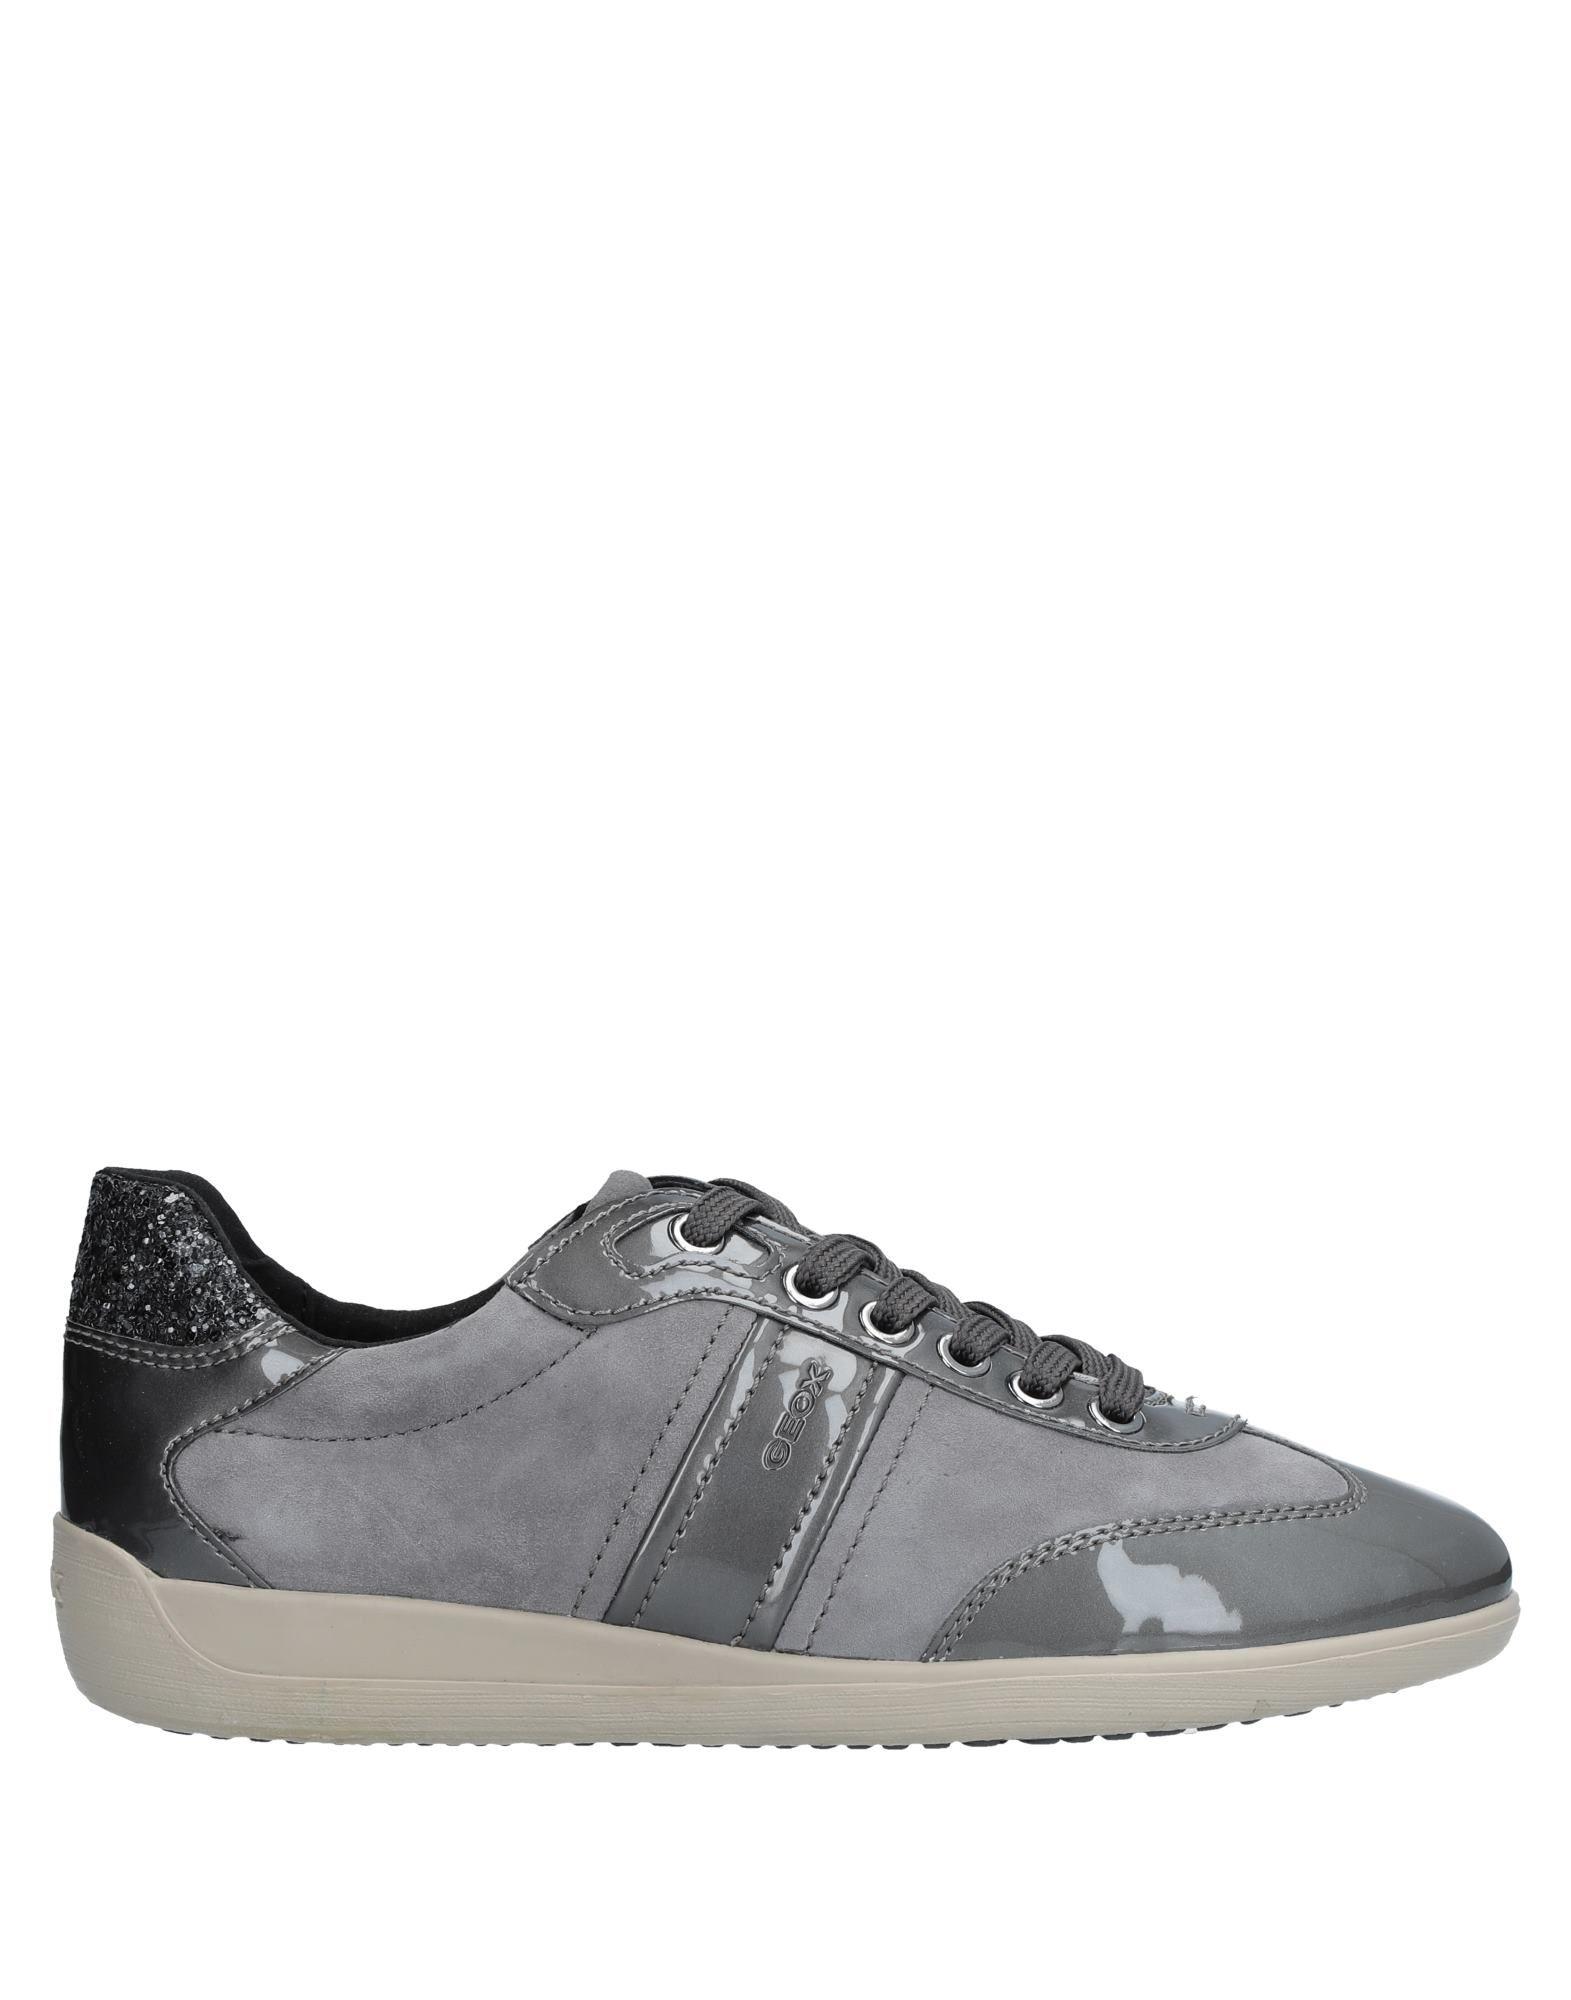 Sneakers Scarpe Geox Donna - 11391707HV Scarpe Sneakers comode e distintive 2020d8